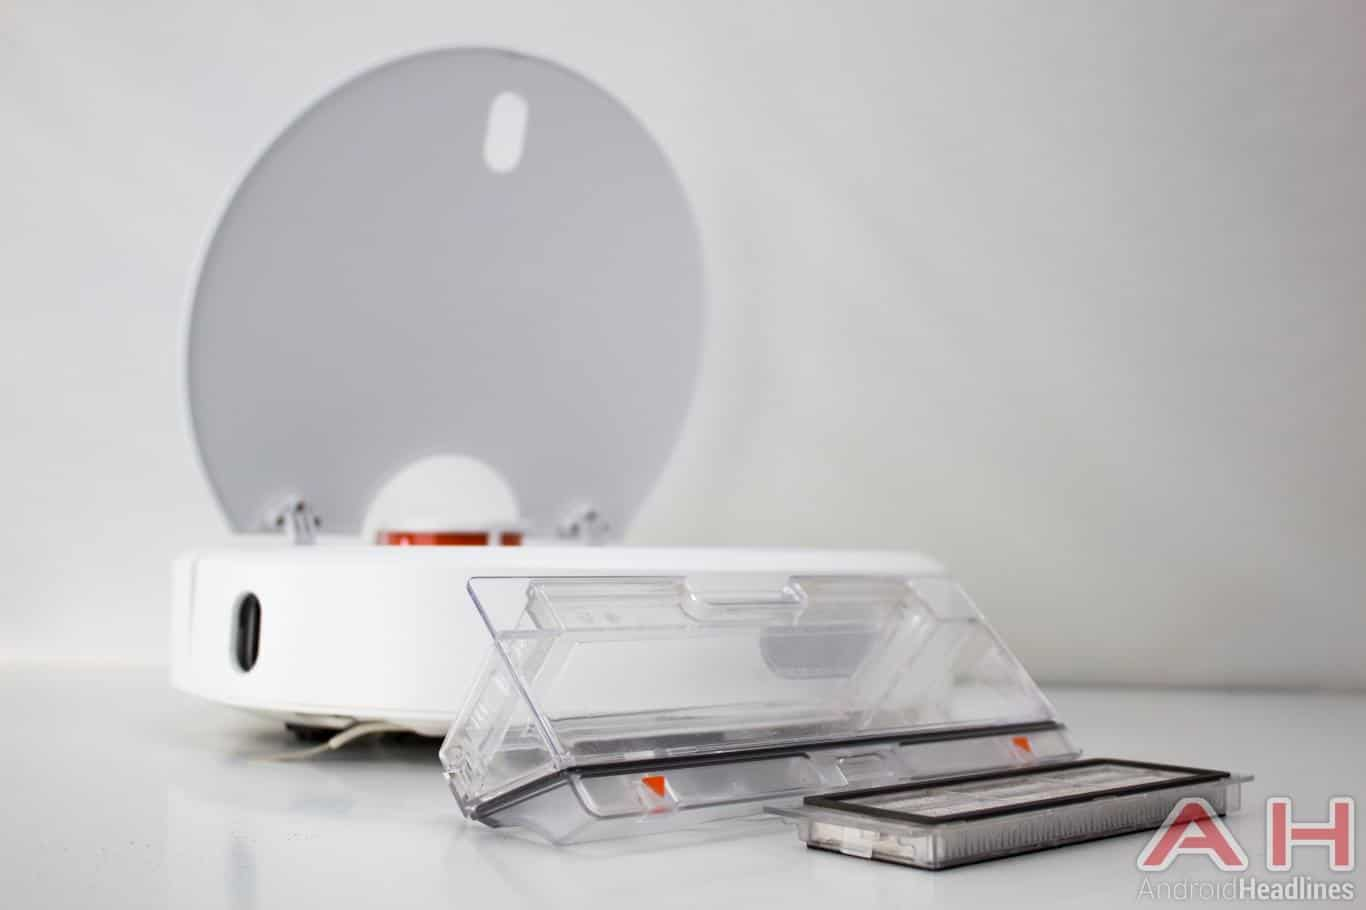 Xiaomi Mi Robot Vacuum AH NS dust bin 22